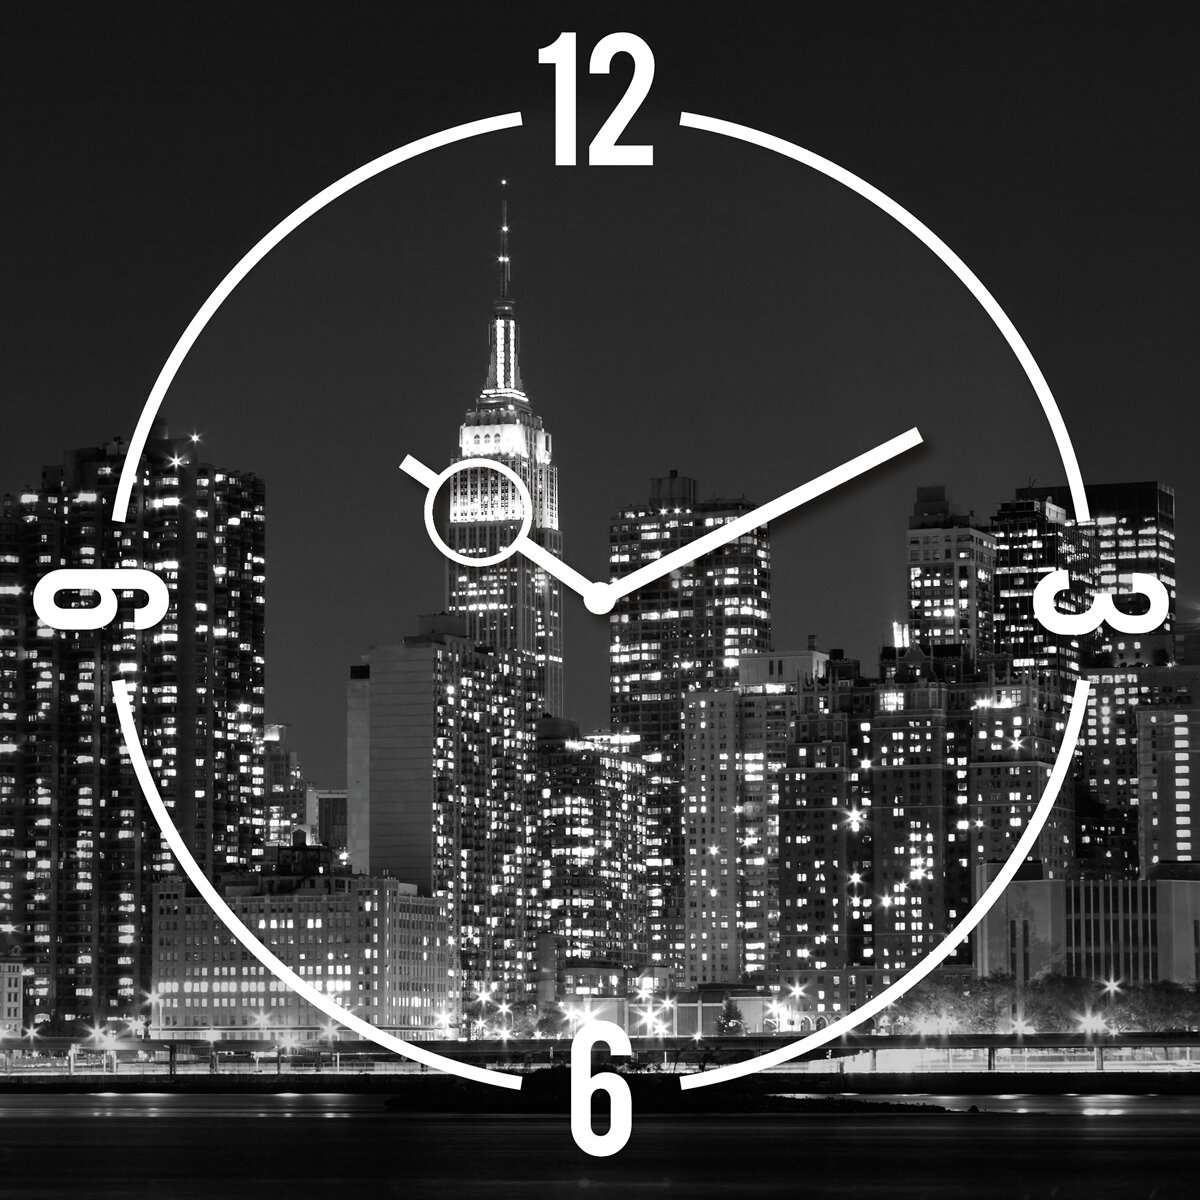 eurographics analoge wanduhr time art new york von manufacturer. Black Bedroom Furniture Sets. Home Design Ideas